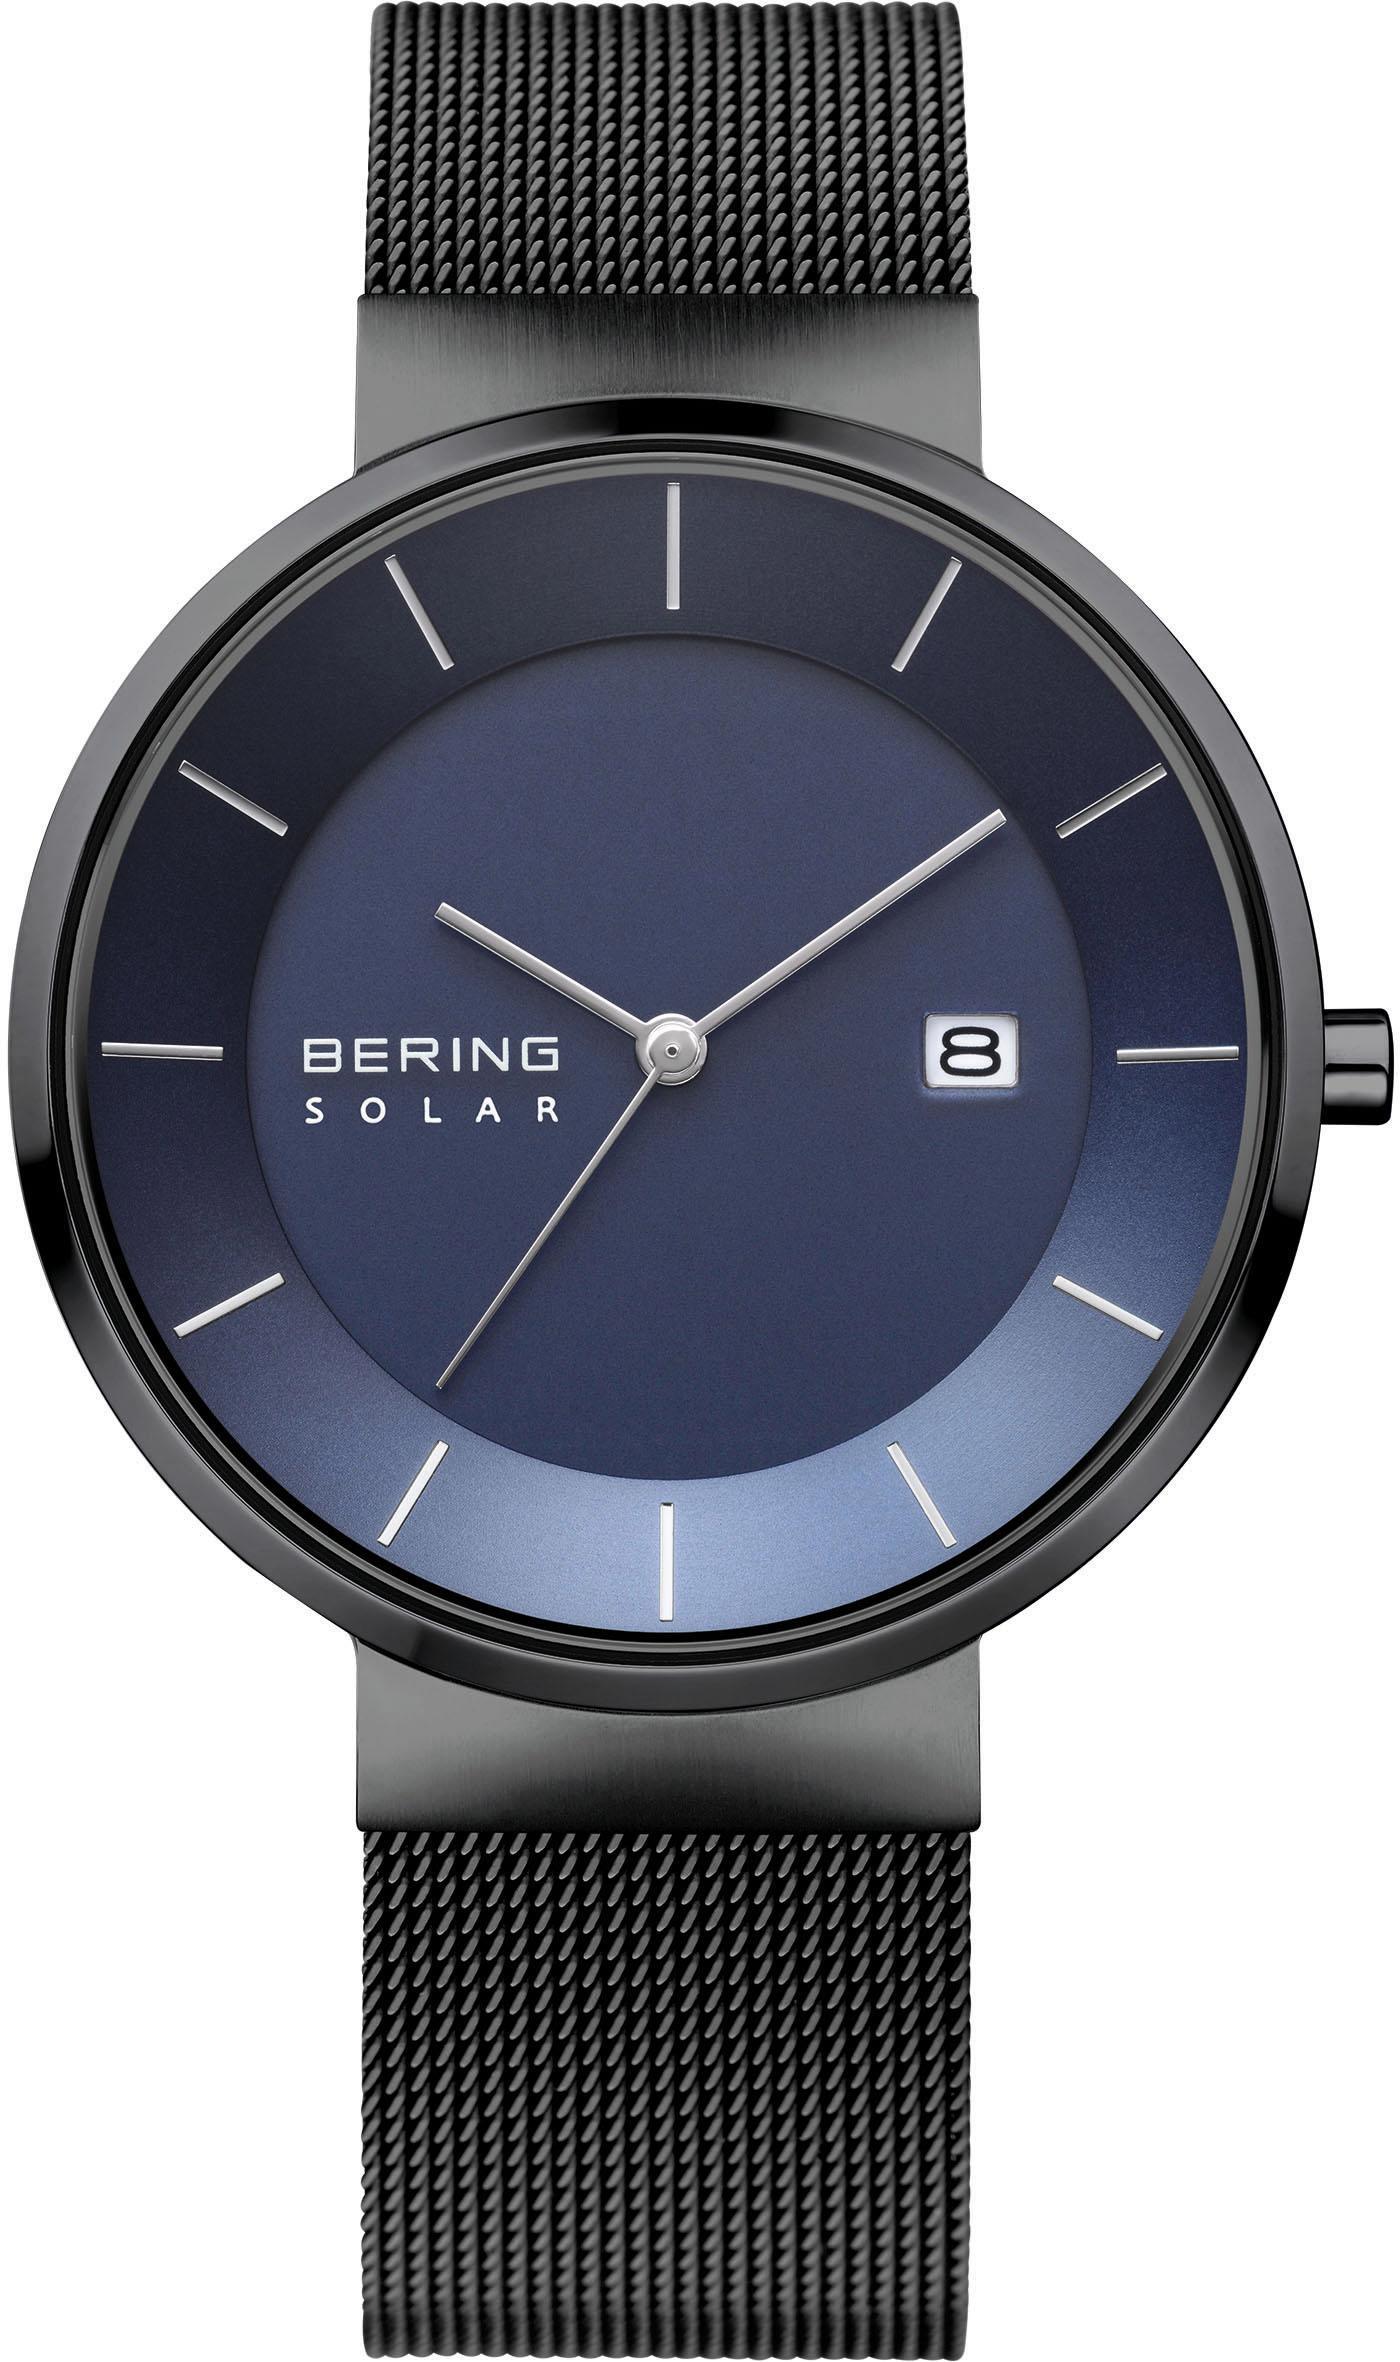 Bering Solaruhr 14639-227 | Uhren > Solaruhren | Schwarz | Bering